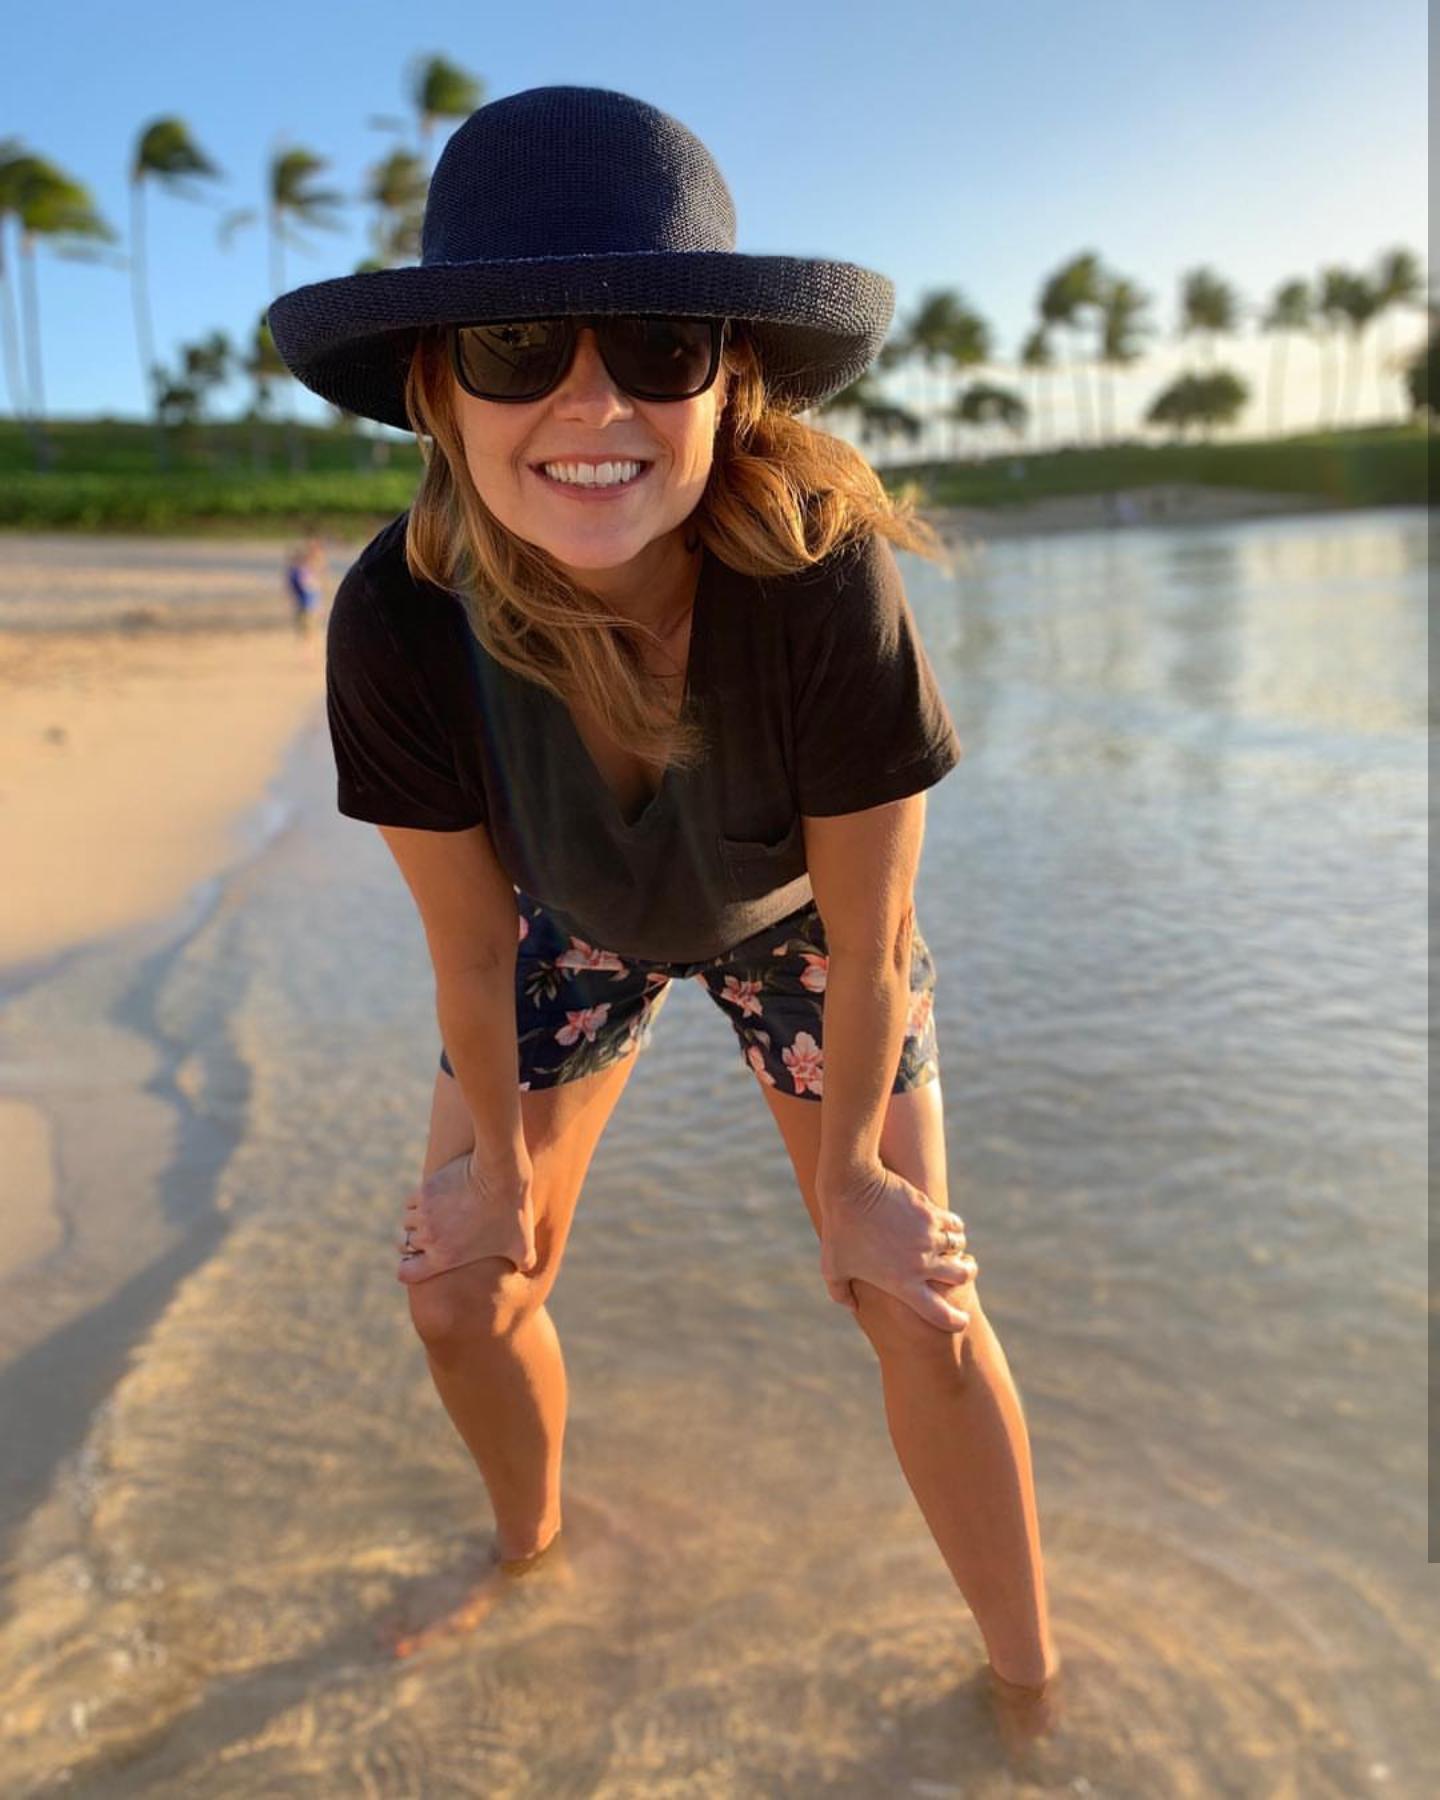 Jenna fischer in walk hard nude pics